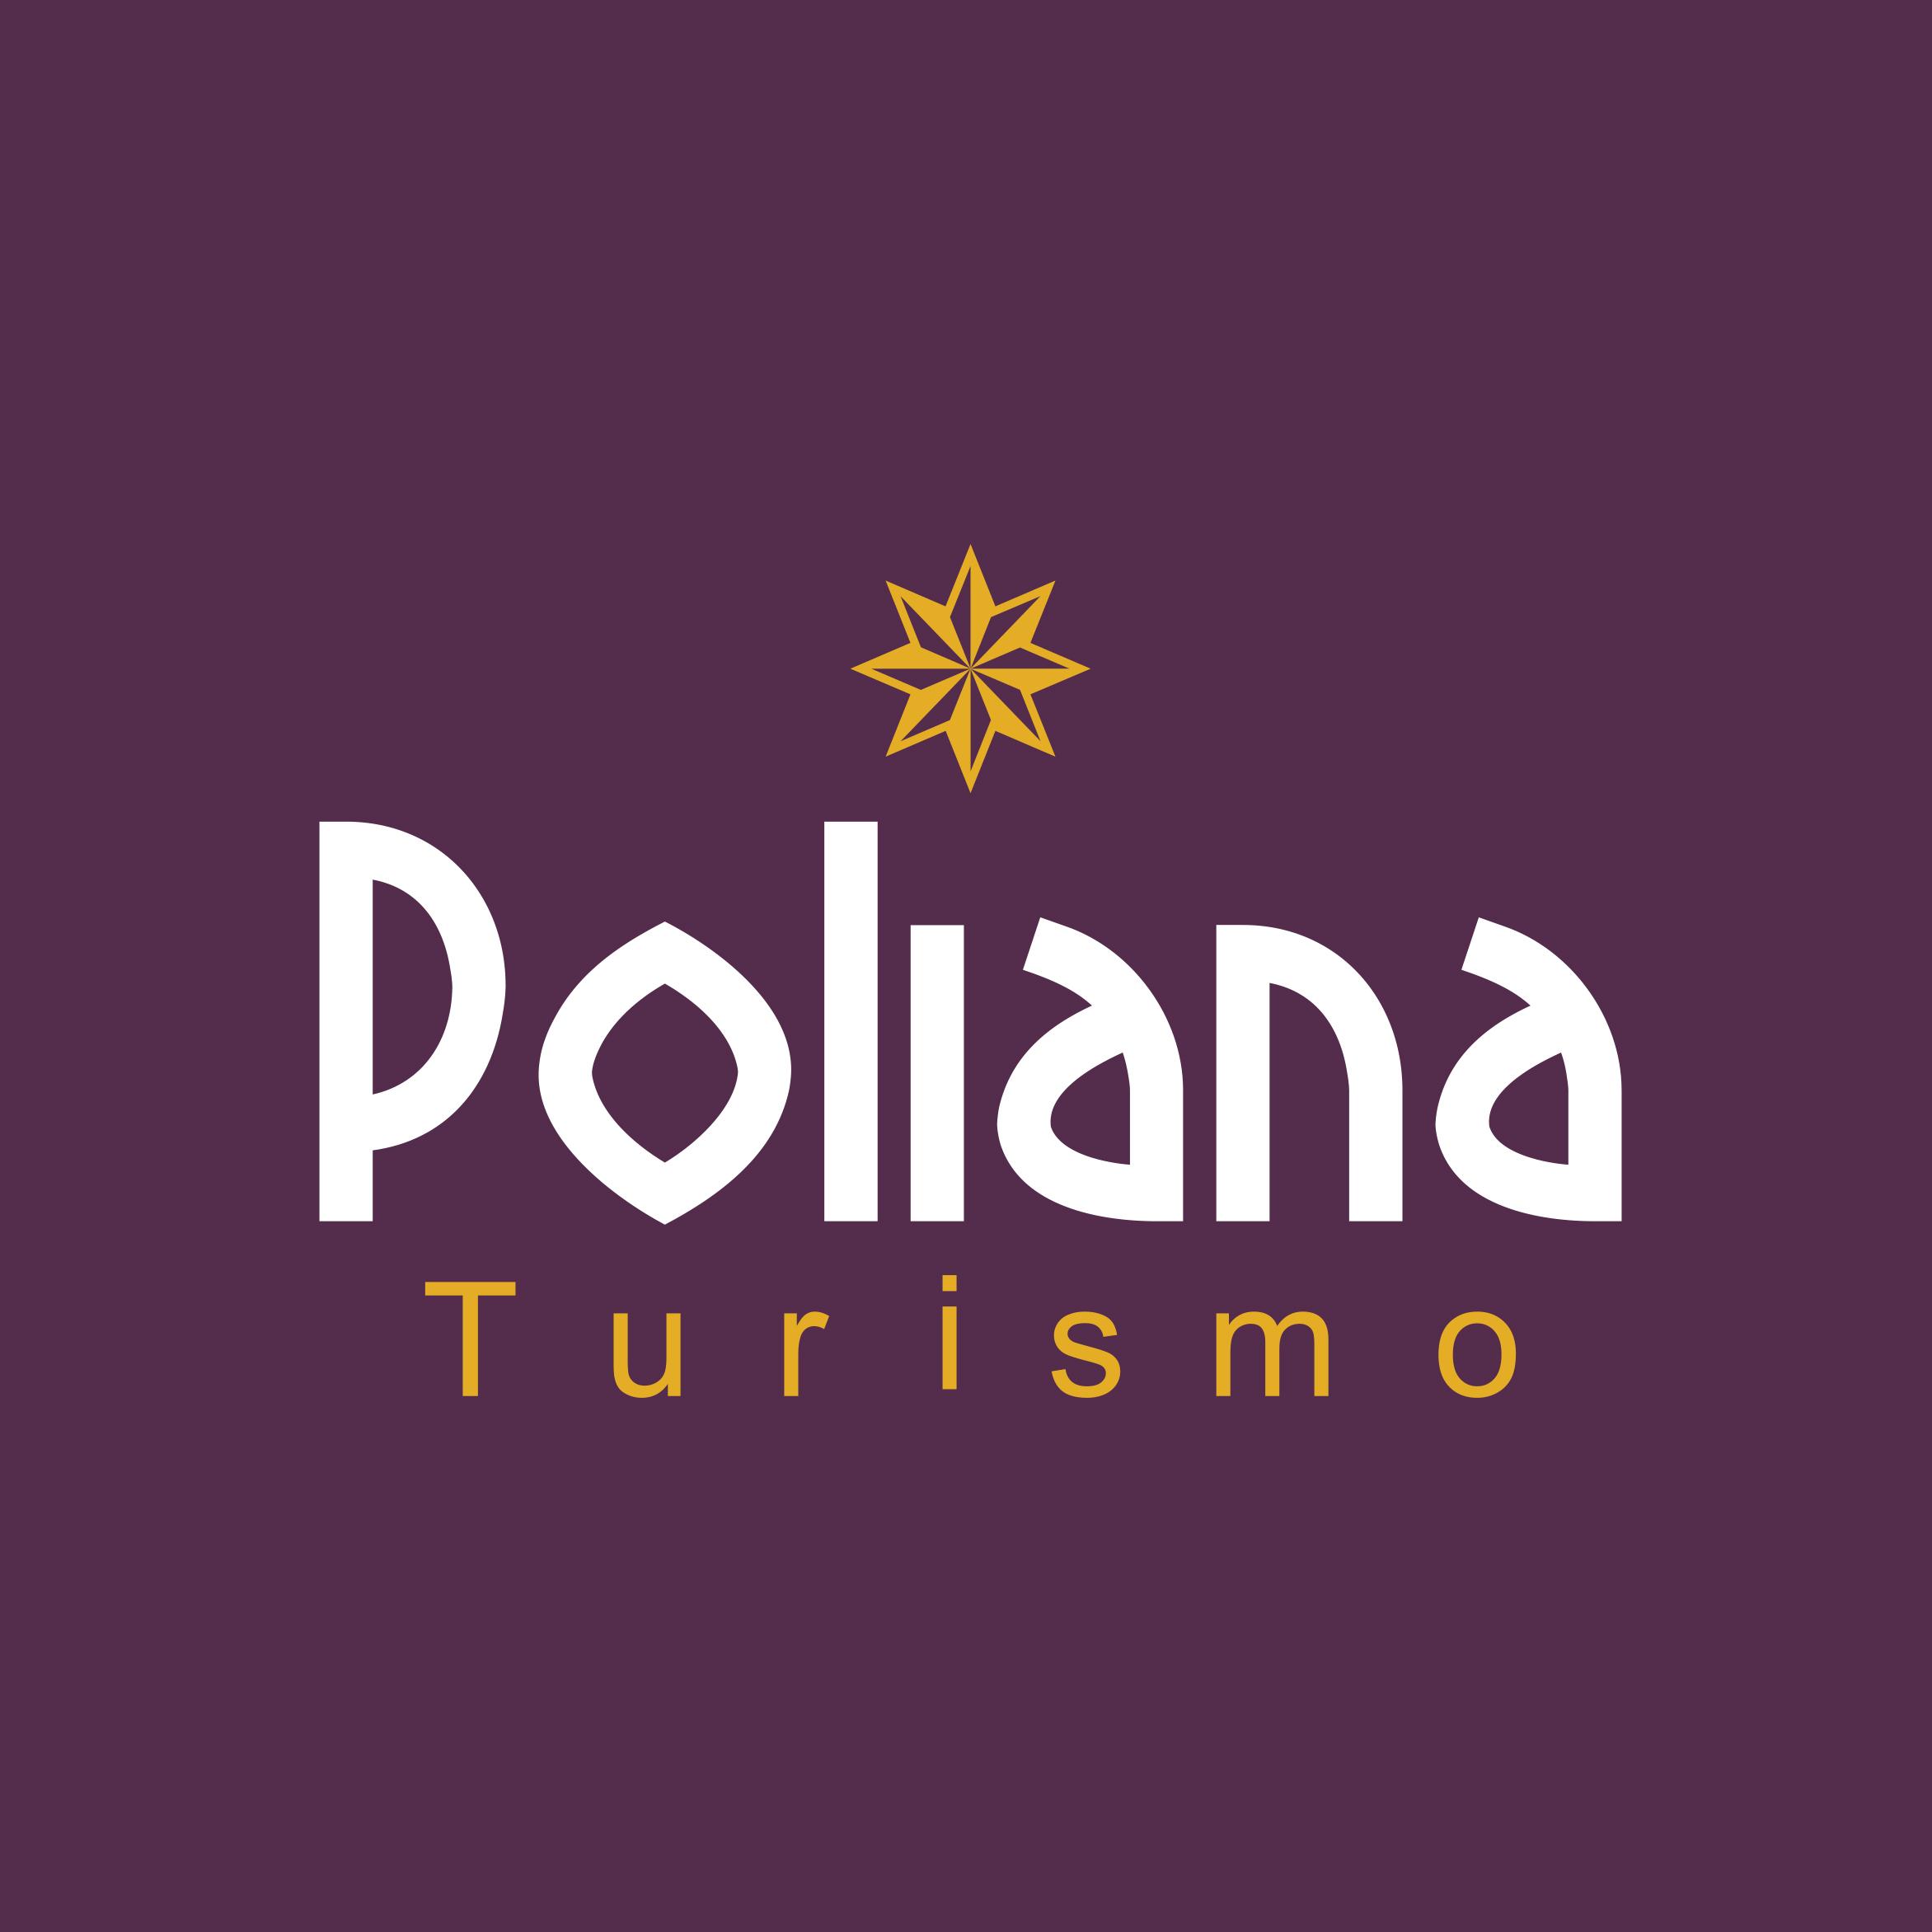 Poliana turismo